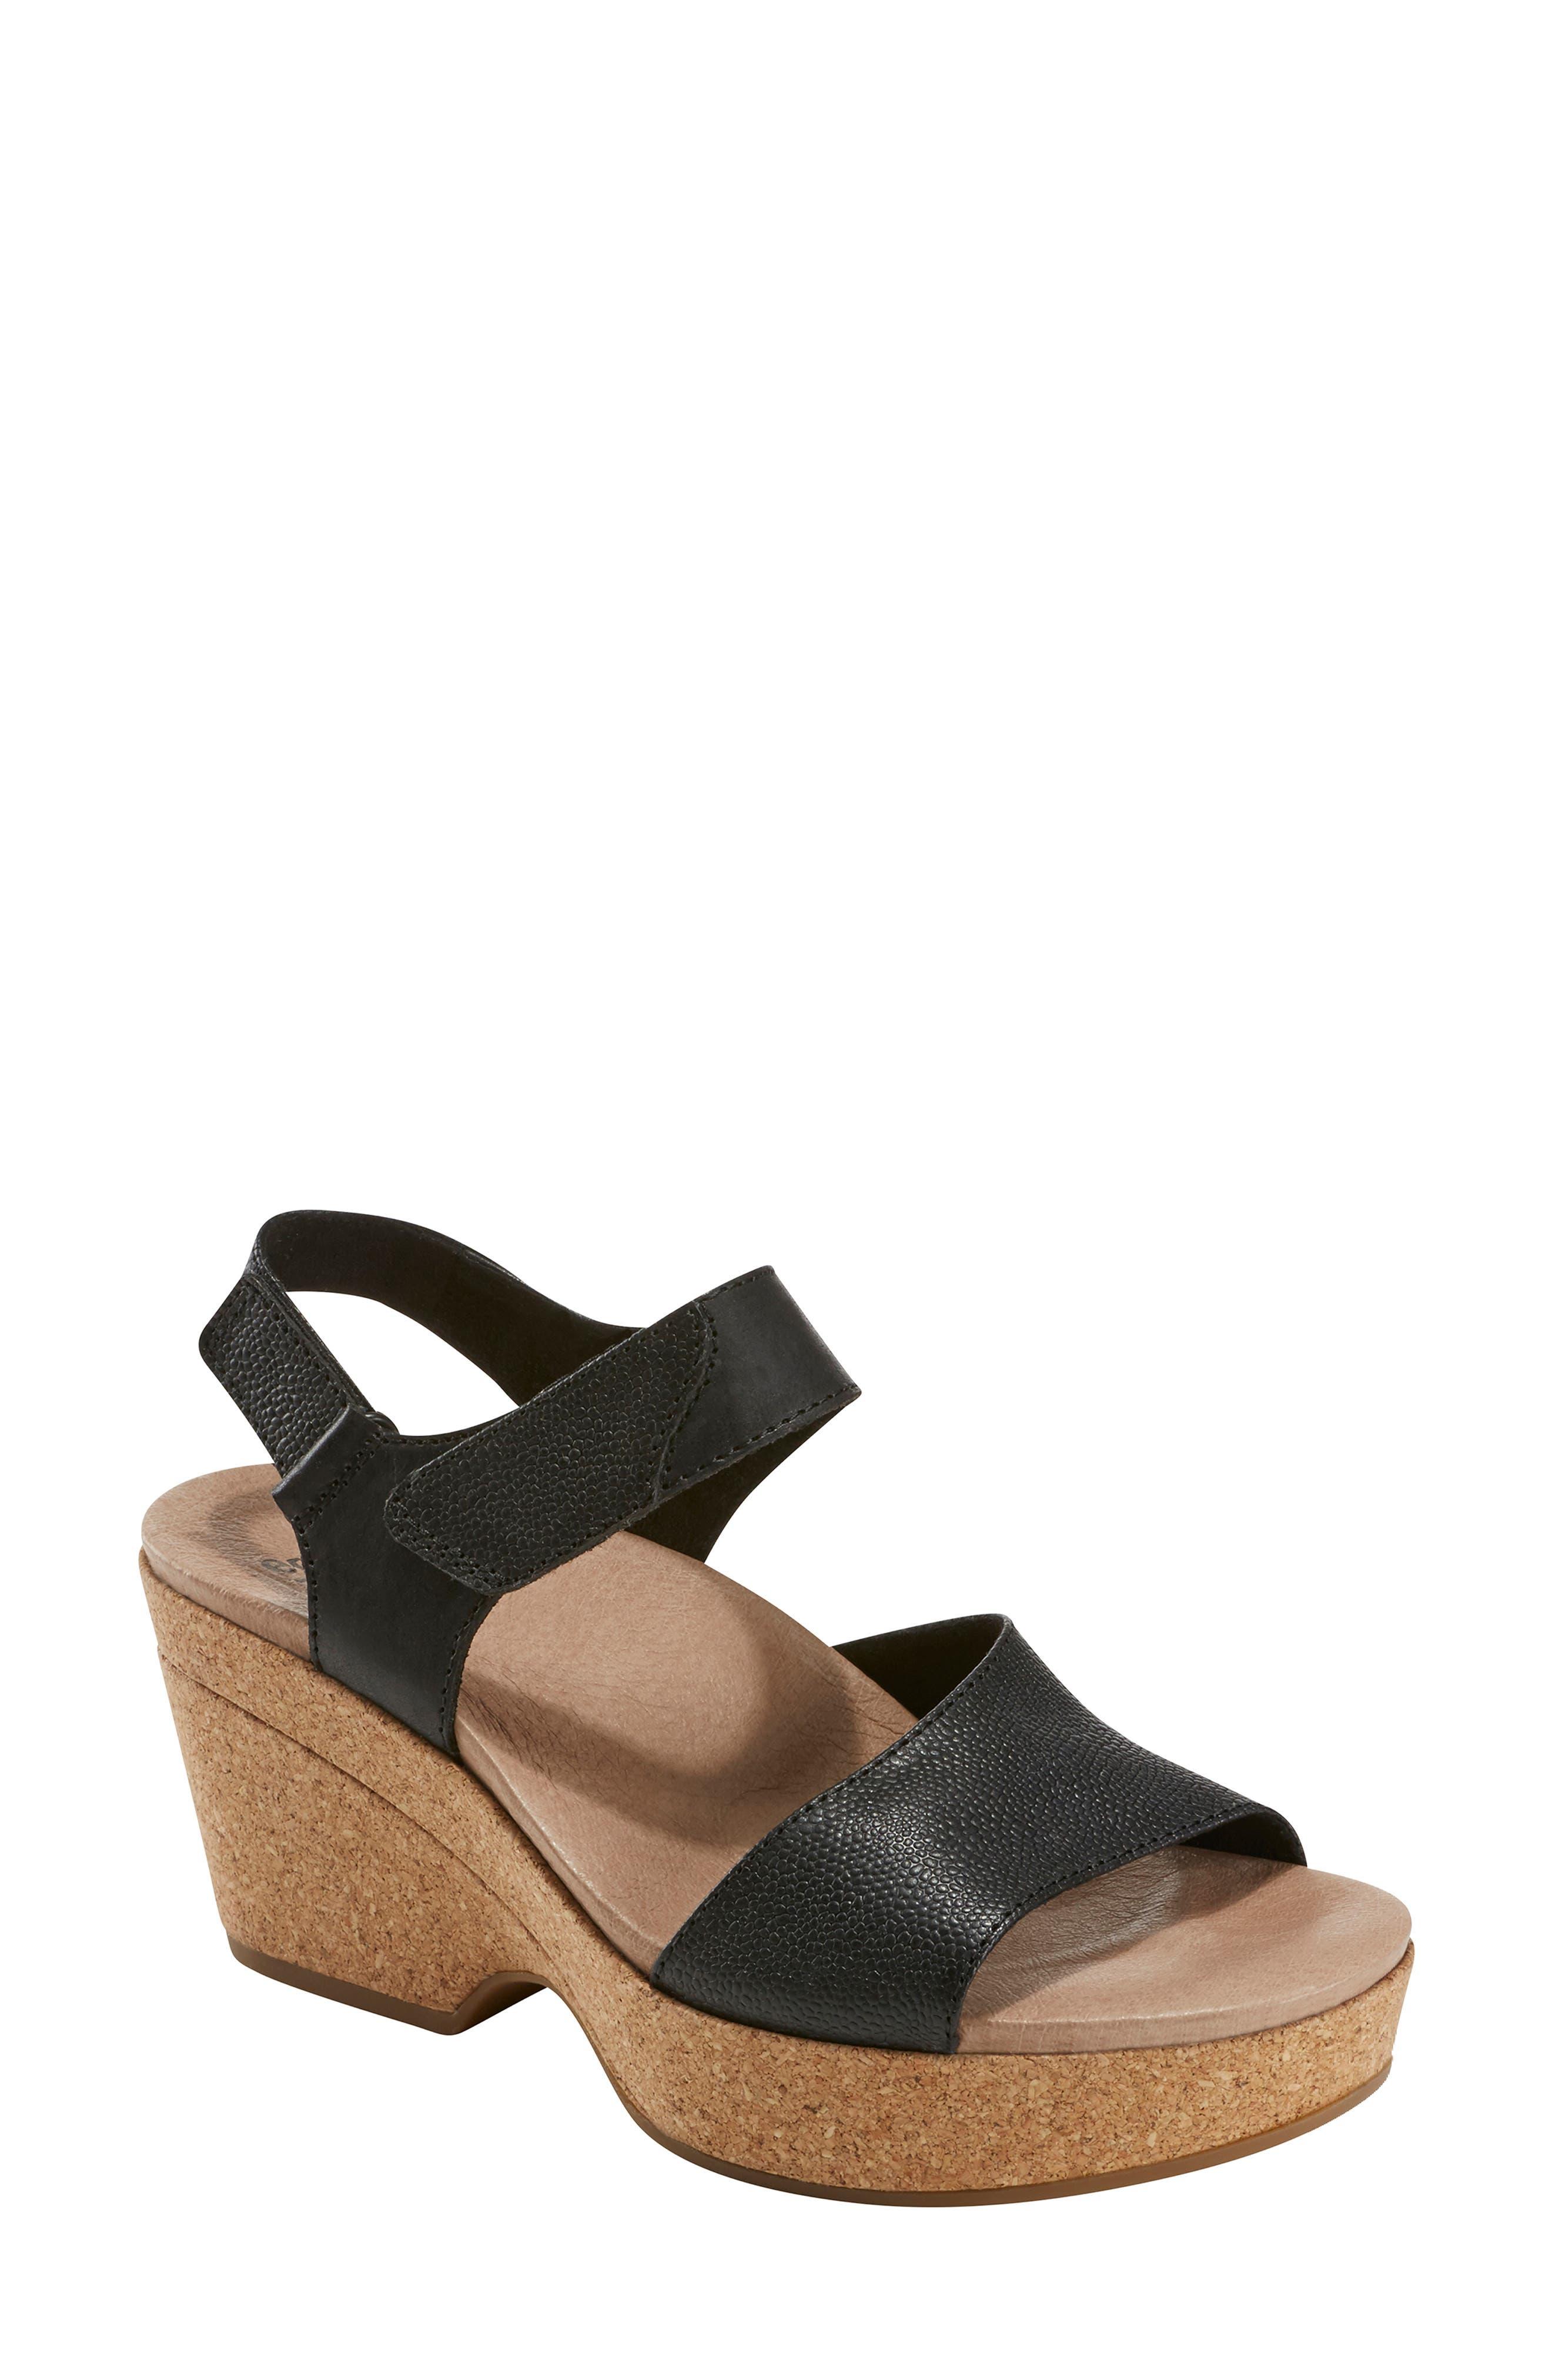 EARTH<SUP>®</SUP> Kella Platform Sandal, Main, color, BLACK LEATHER